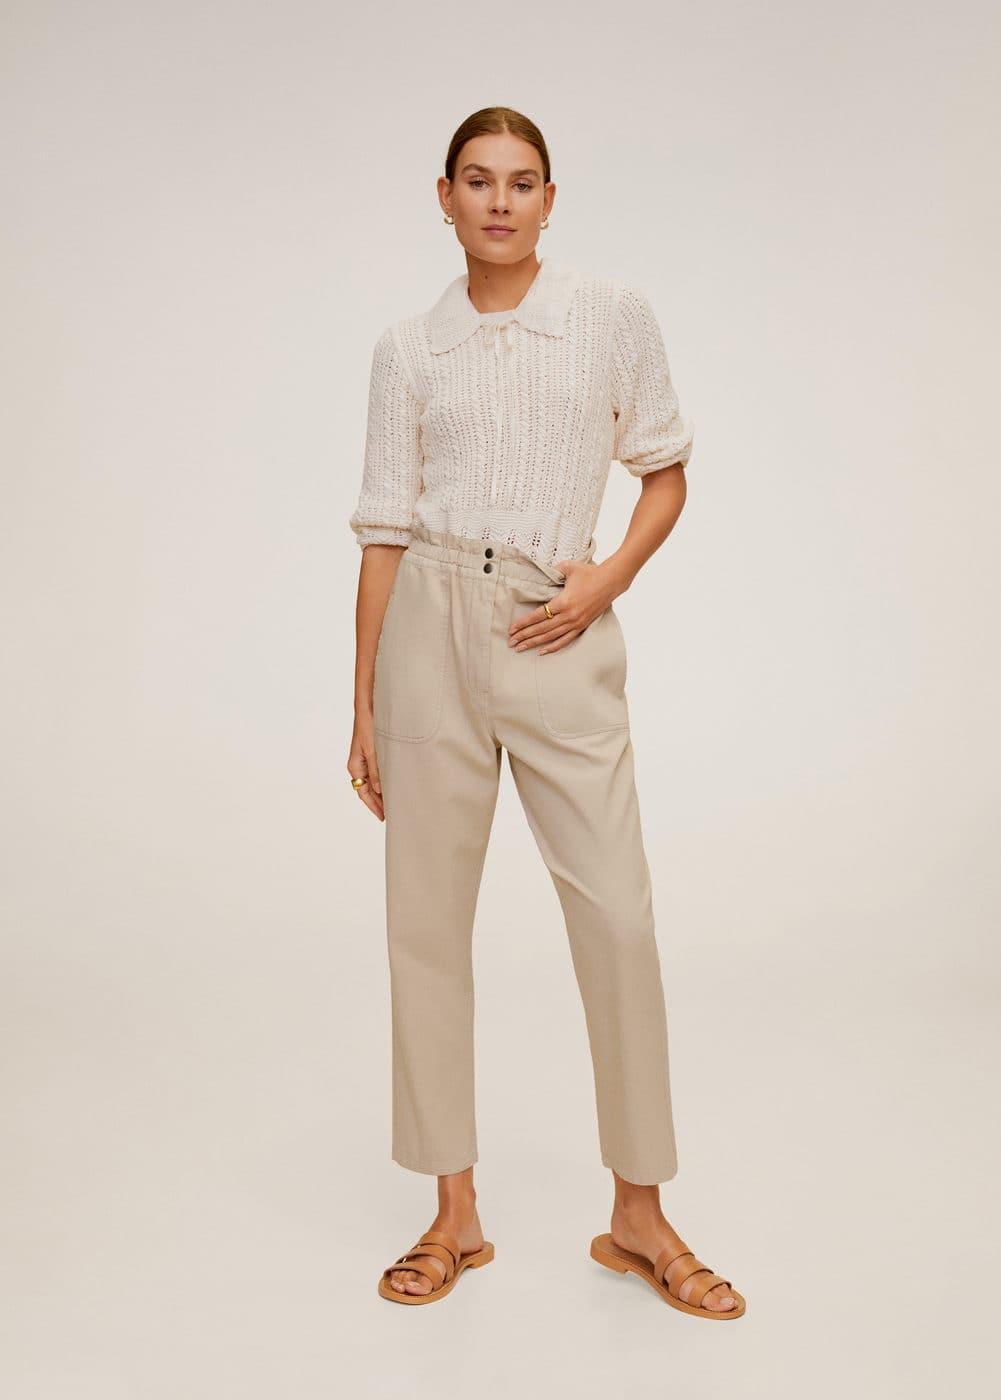 m-urban:jeans slouchy cintura elastica